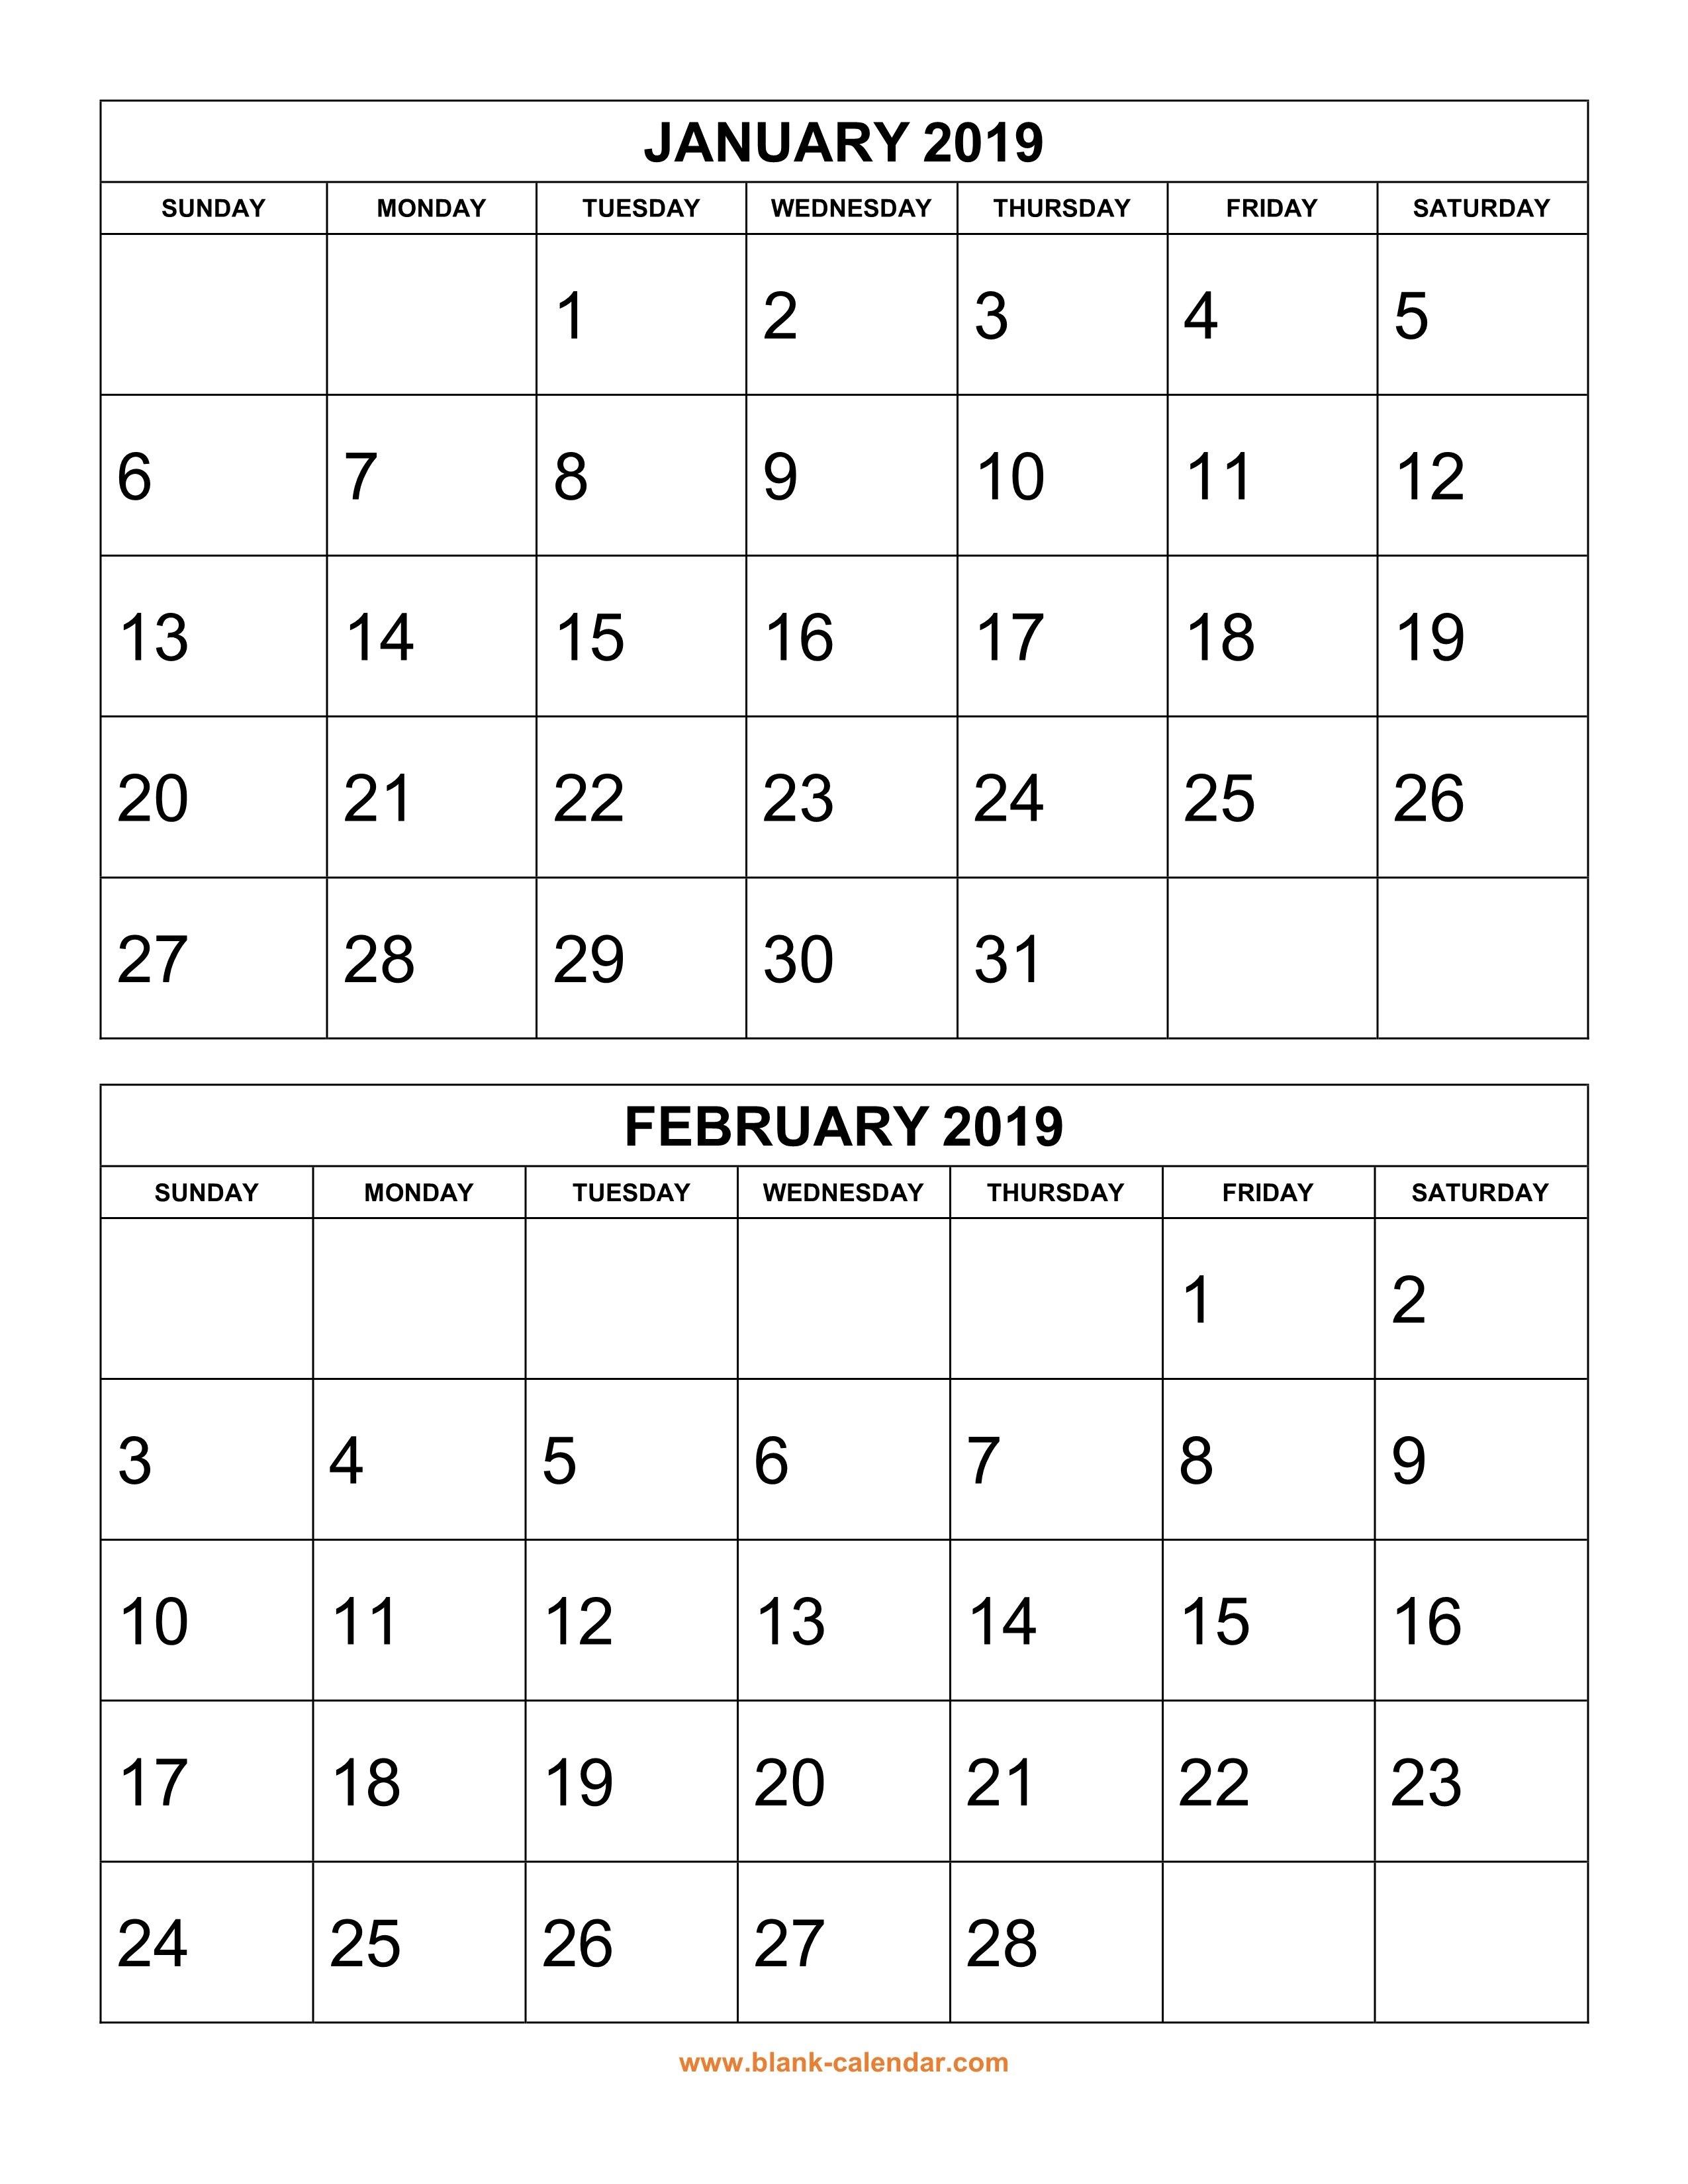 Free Download Printable Calendar 2019, 2 Months Per Page, 6 Pages Calendar 2019 3 Months Per Page